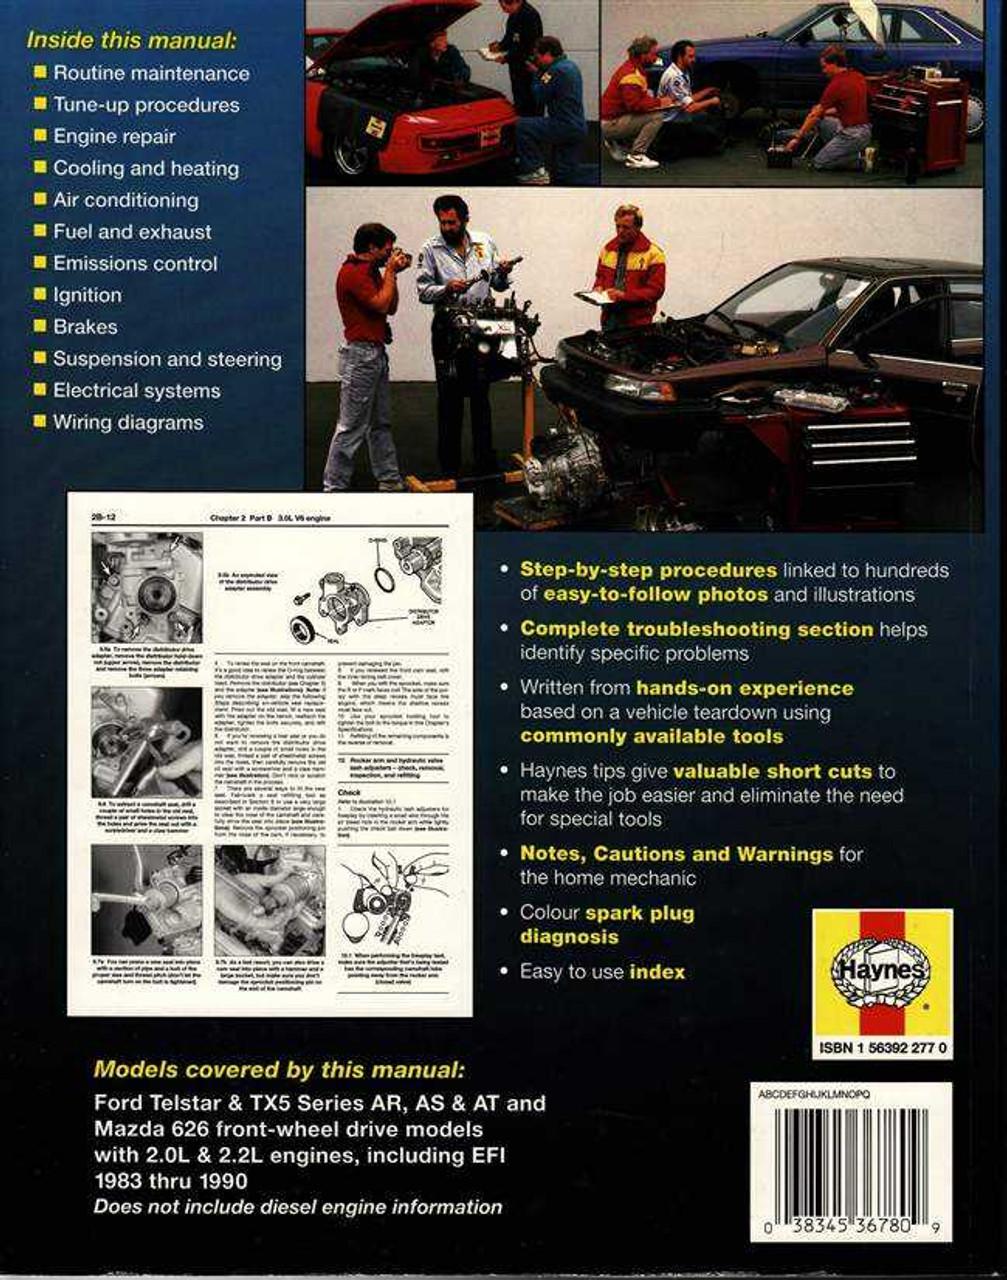 Mtx 7804 manual